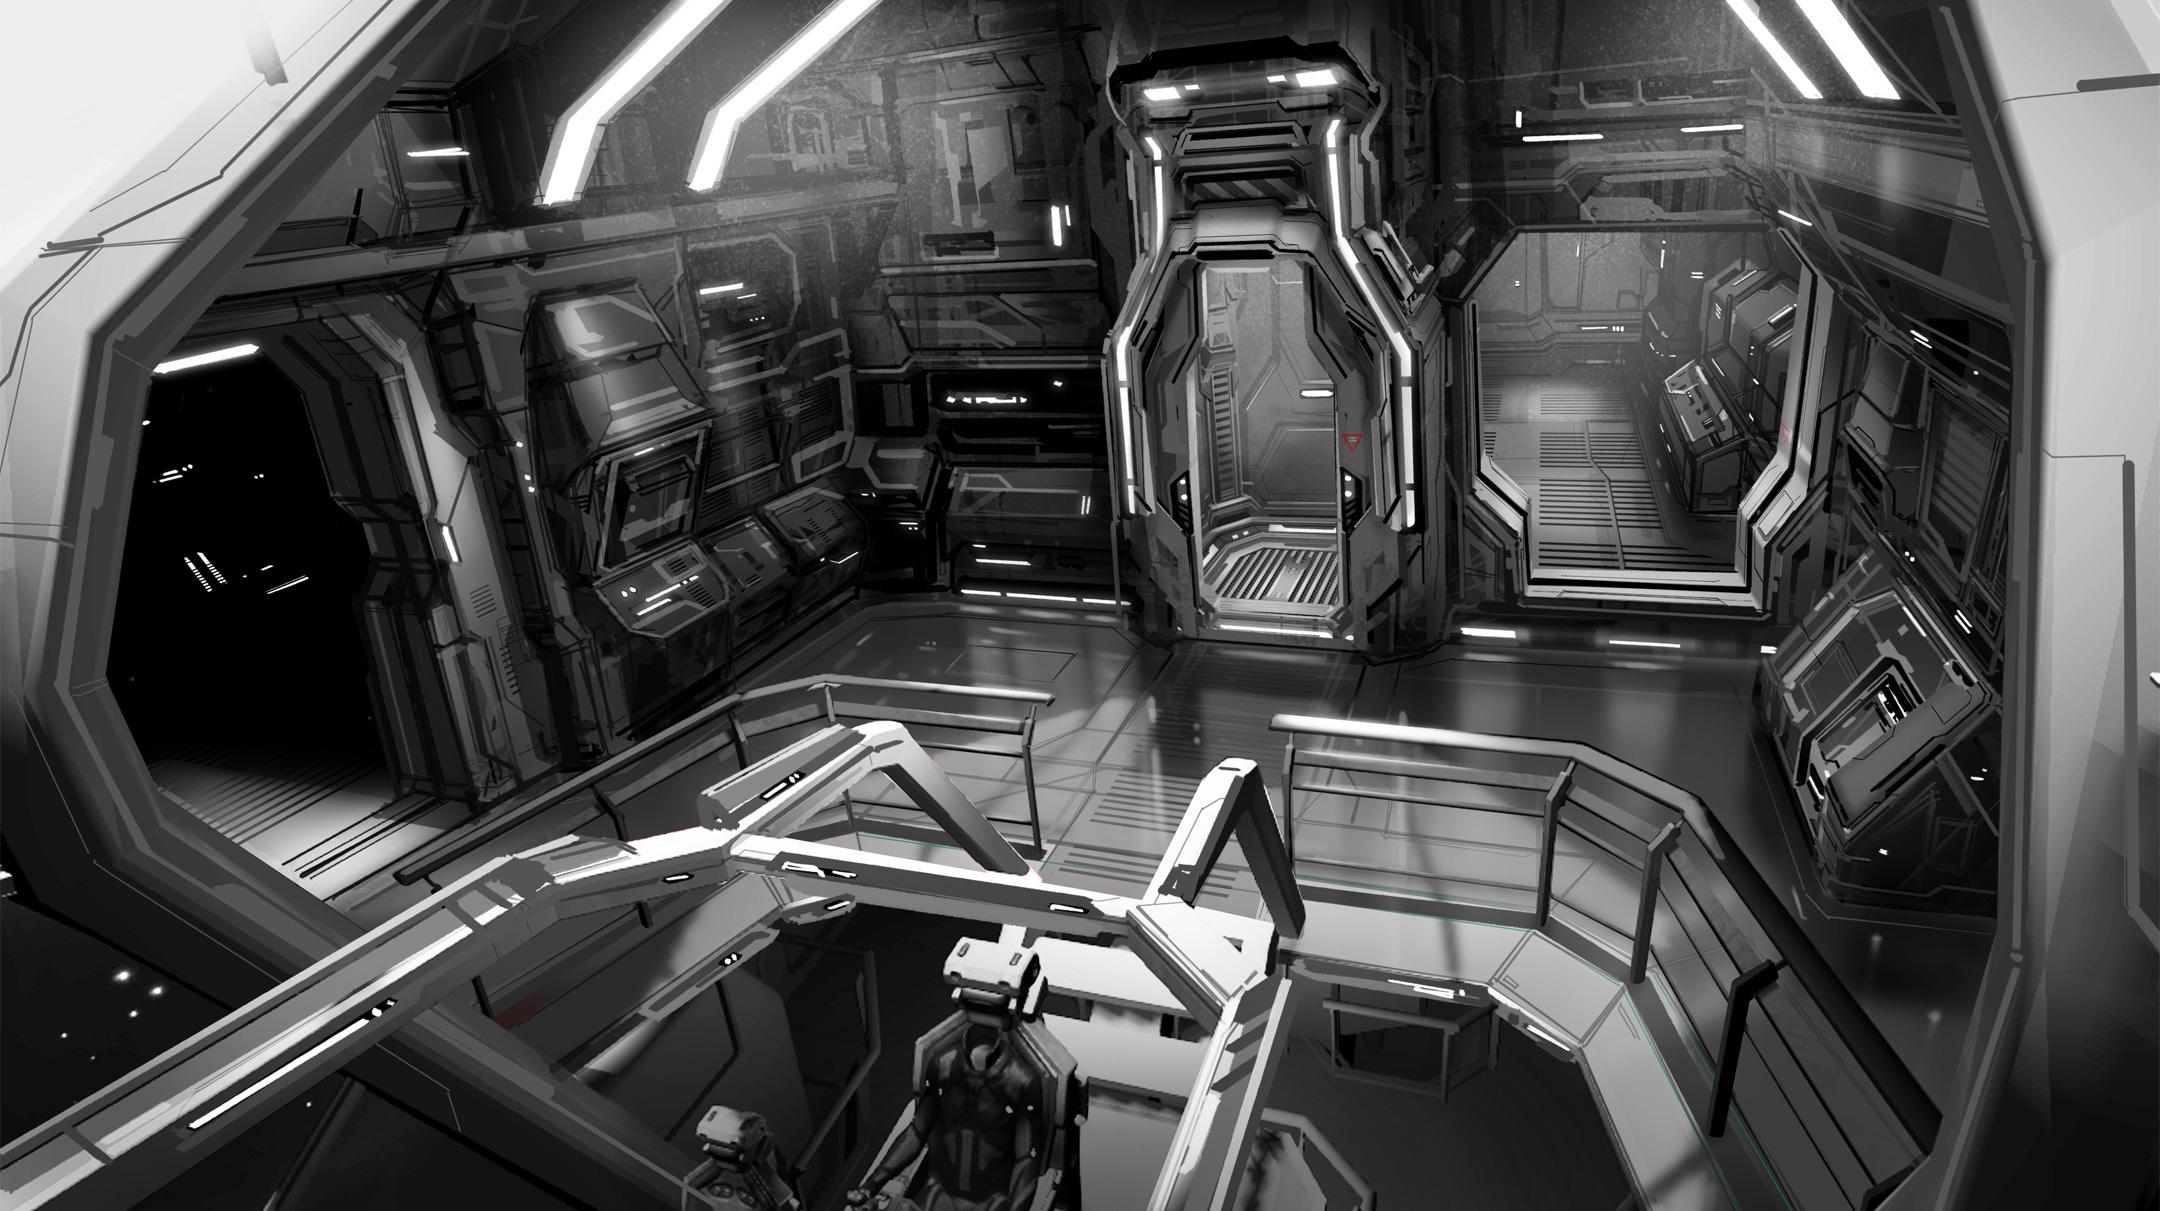 Ships Interiors Concept Art Or Clues